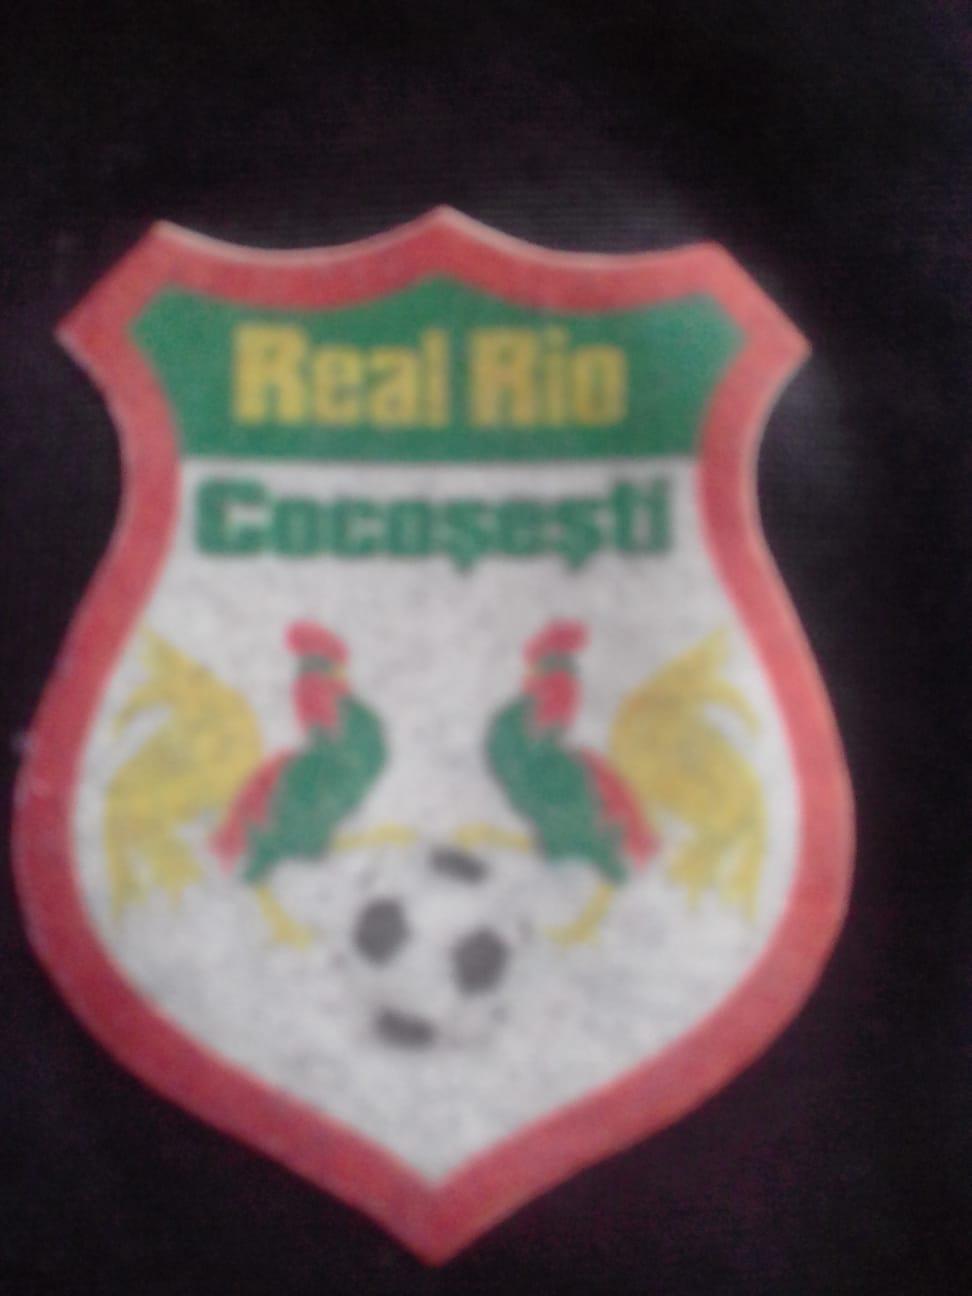 Real Rio Cocoşeşti